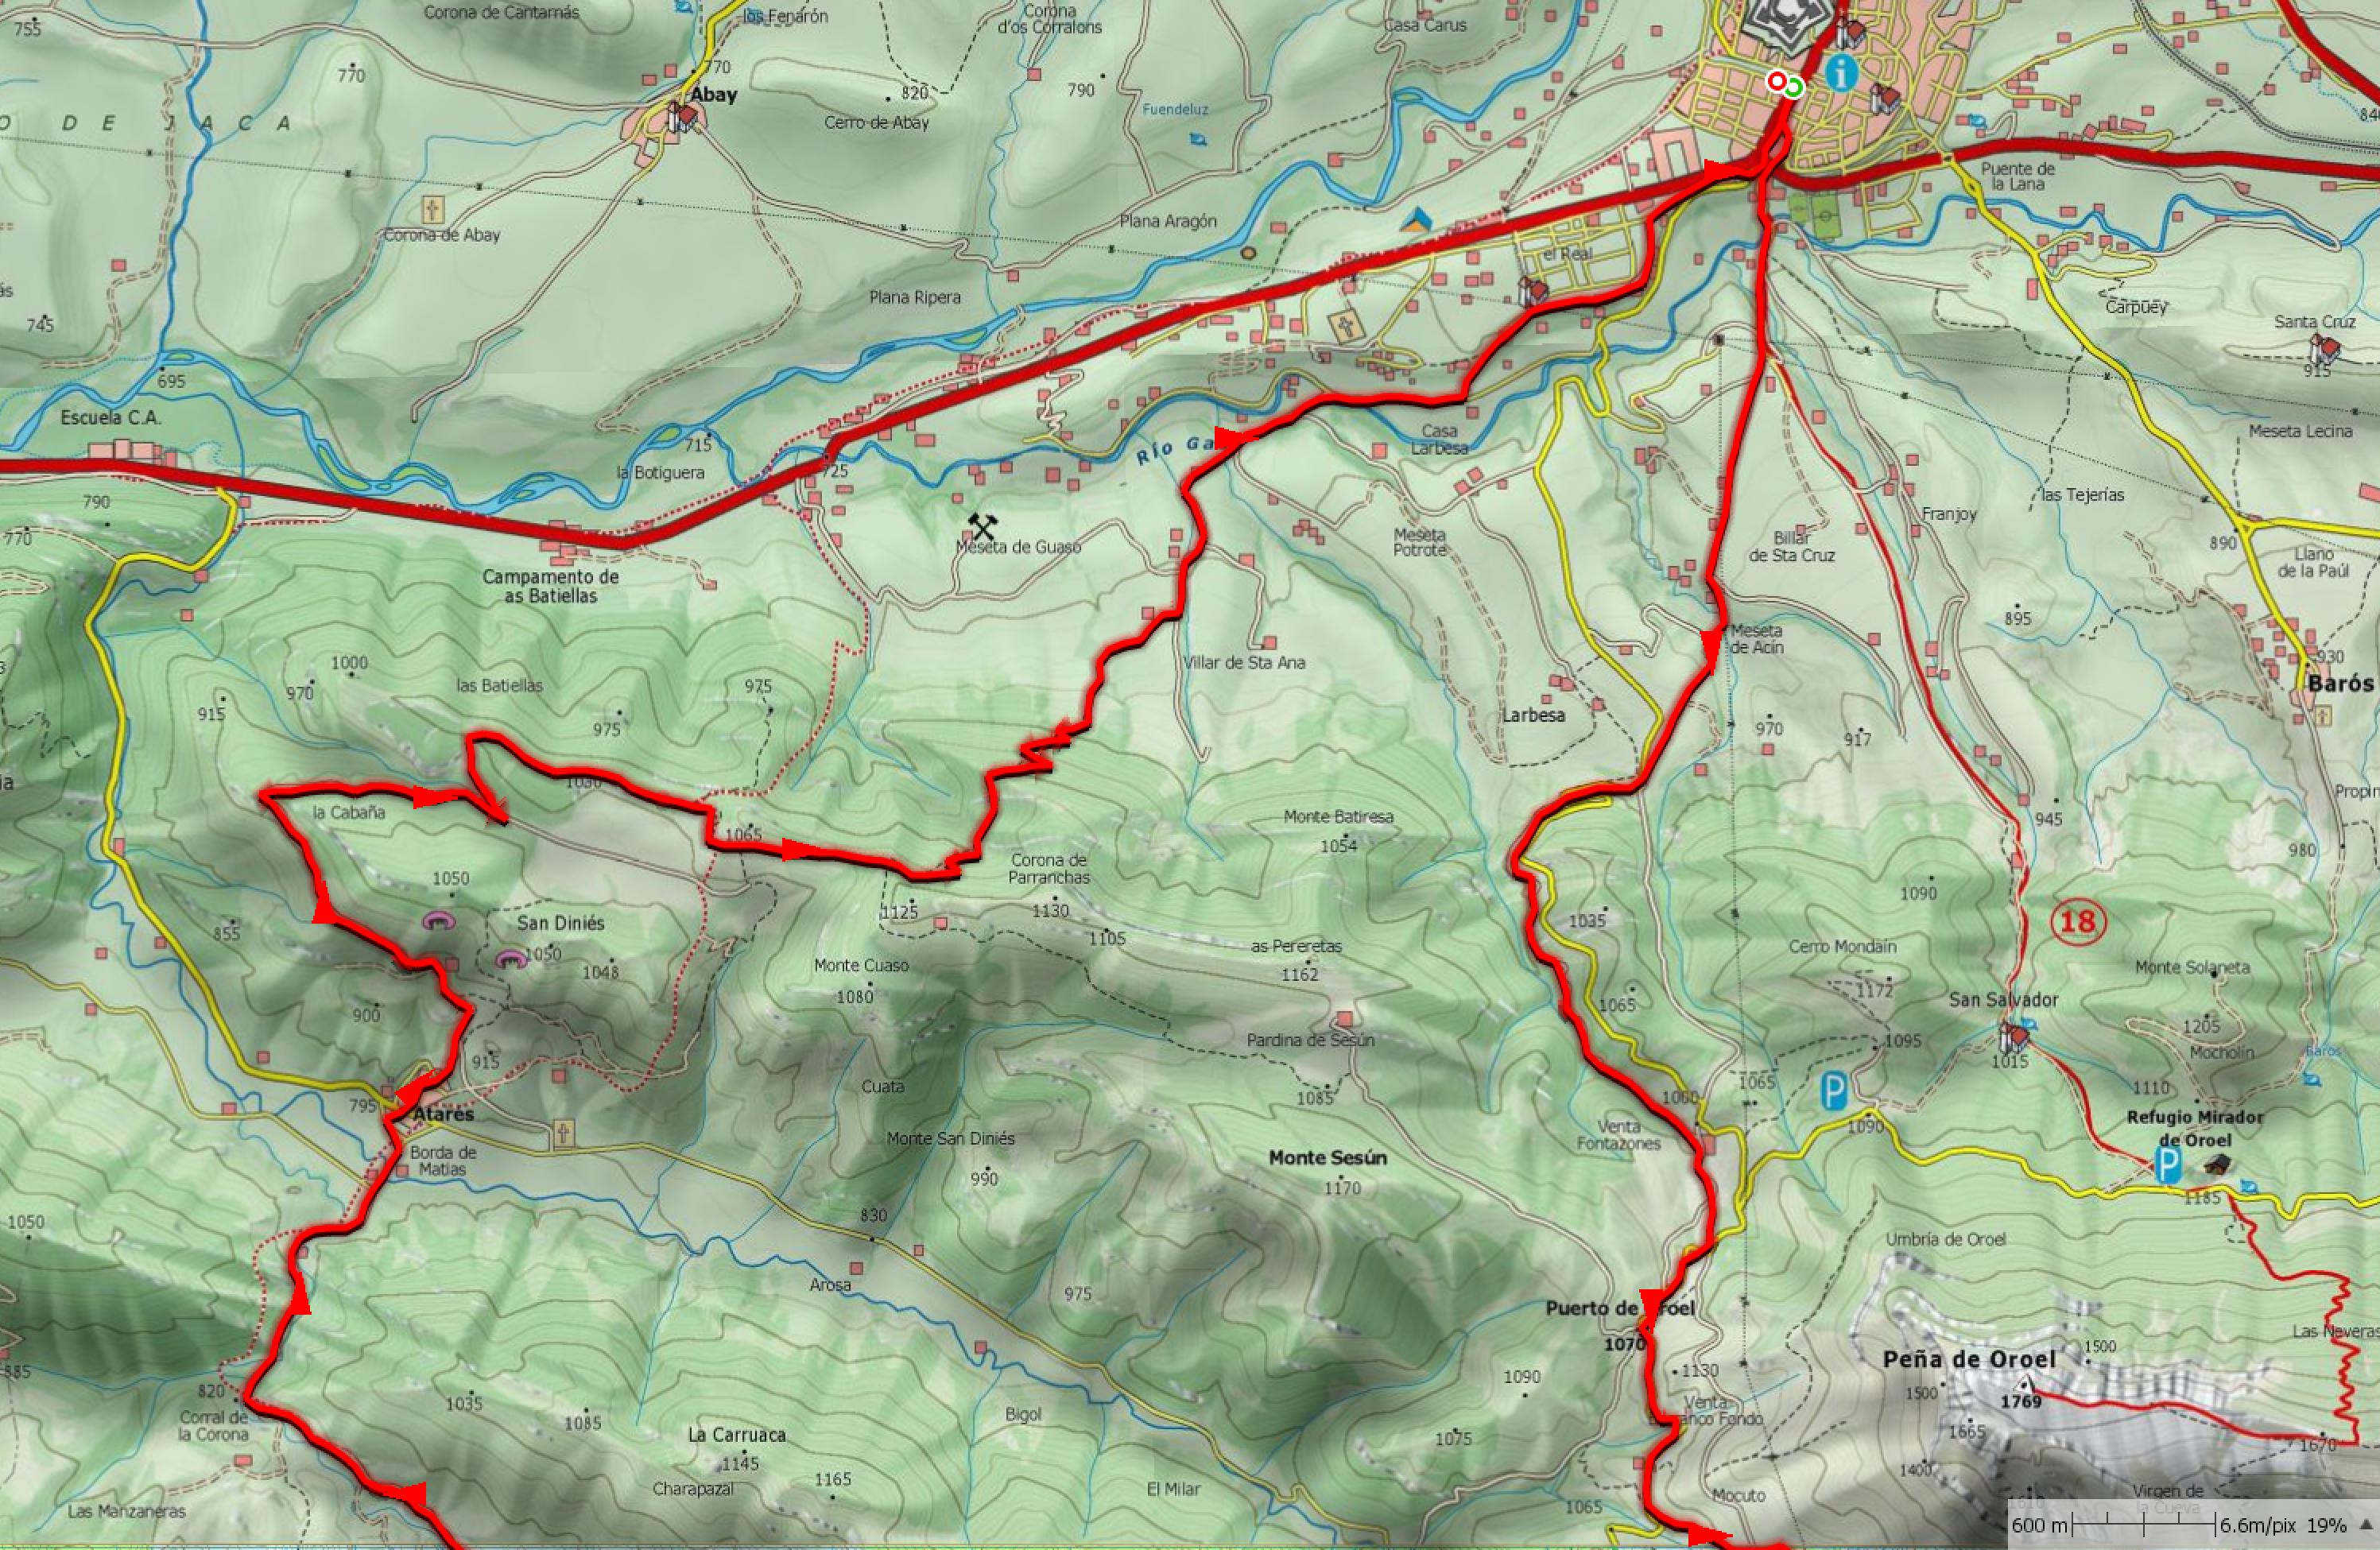 Mapa zona próxima a Jaca